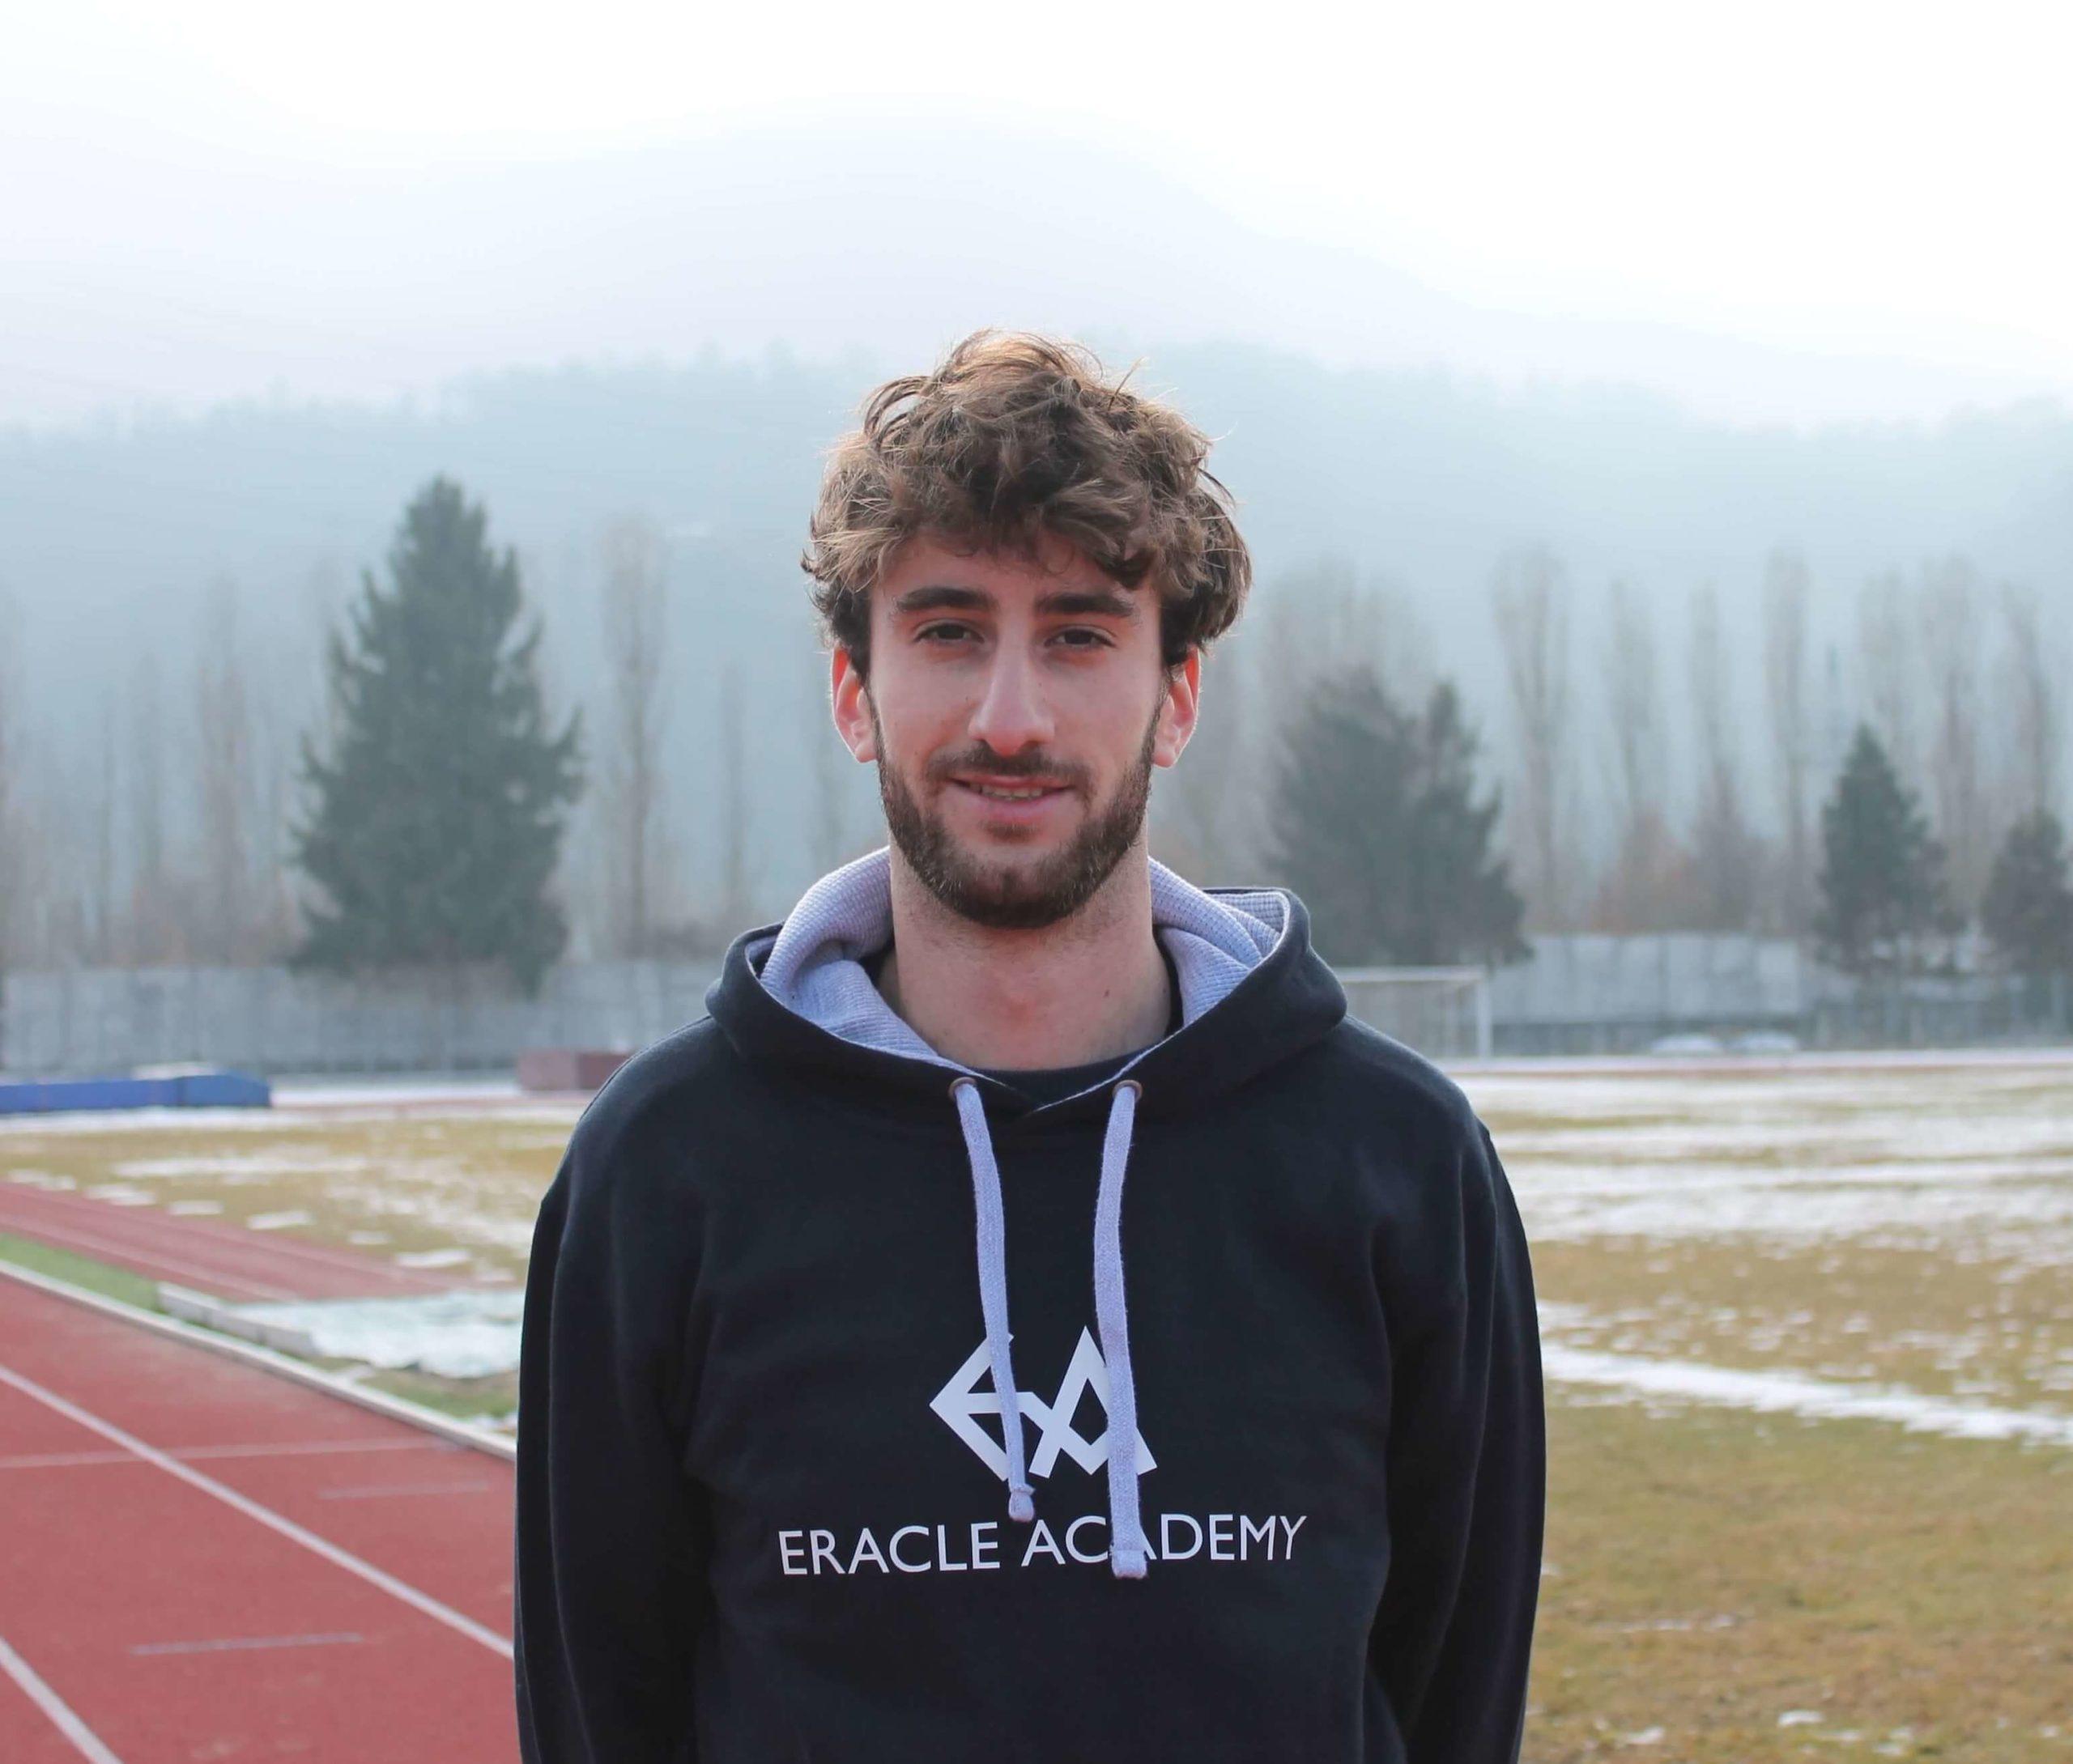 Alberto Franceschi